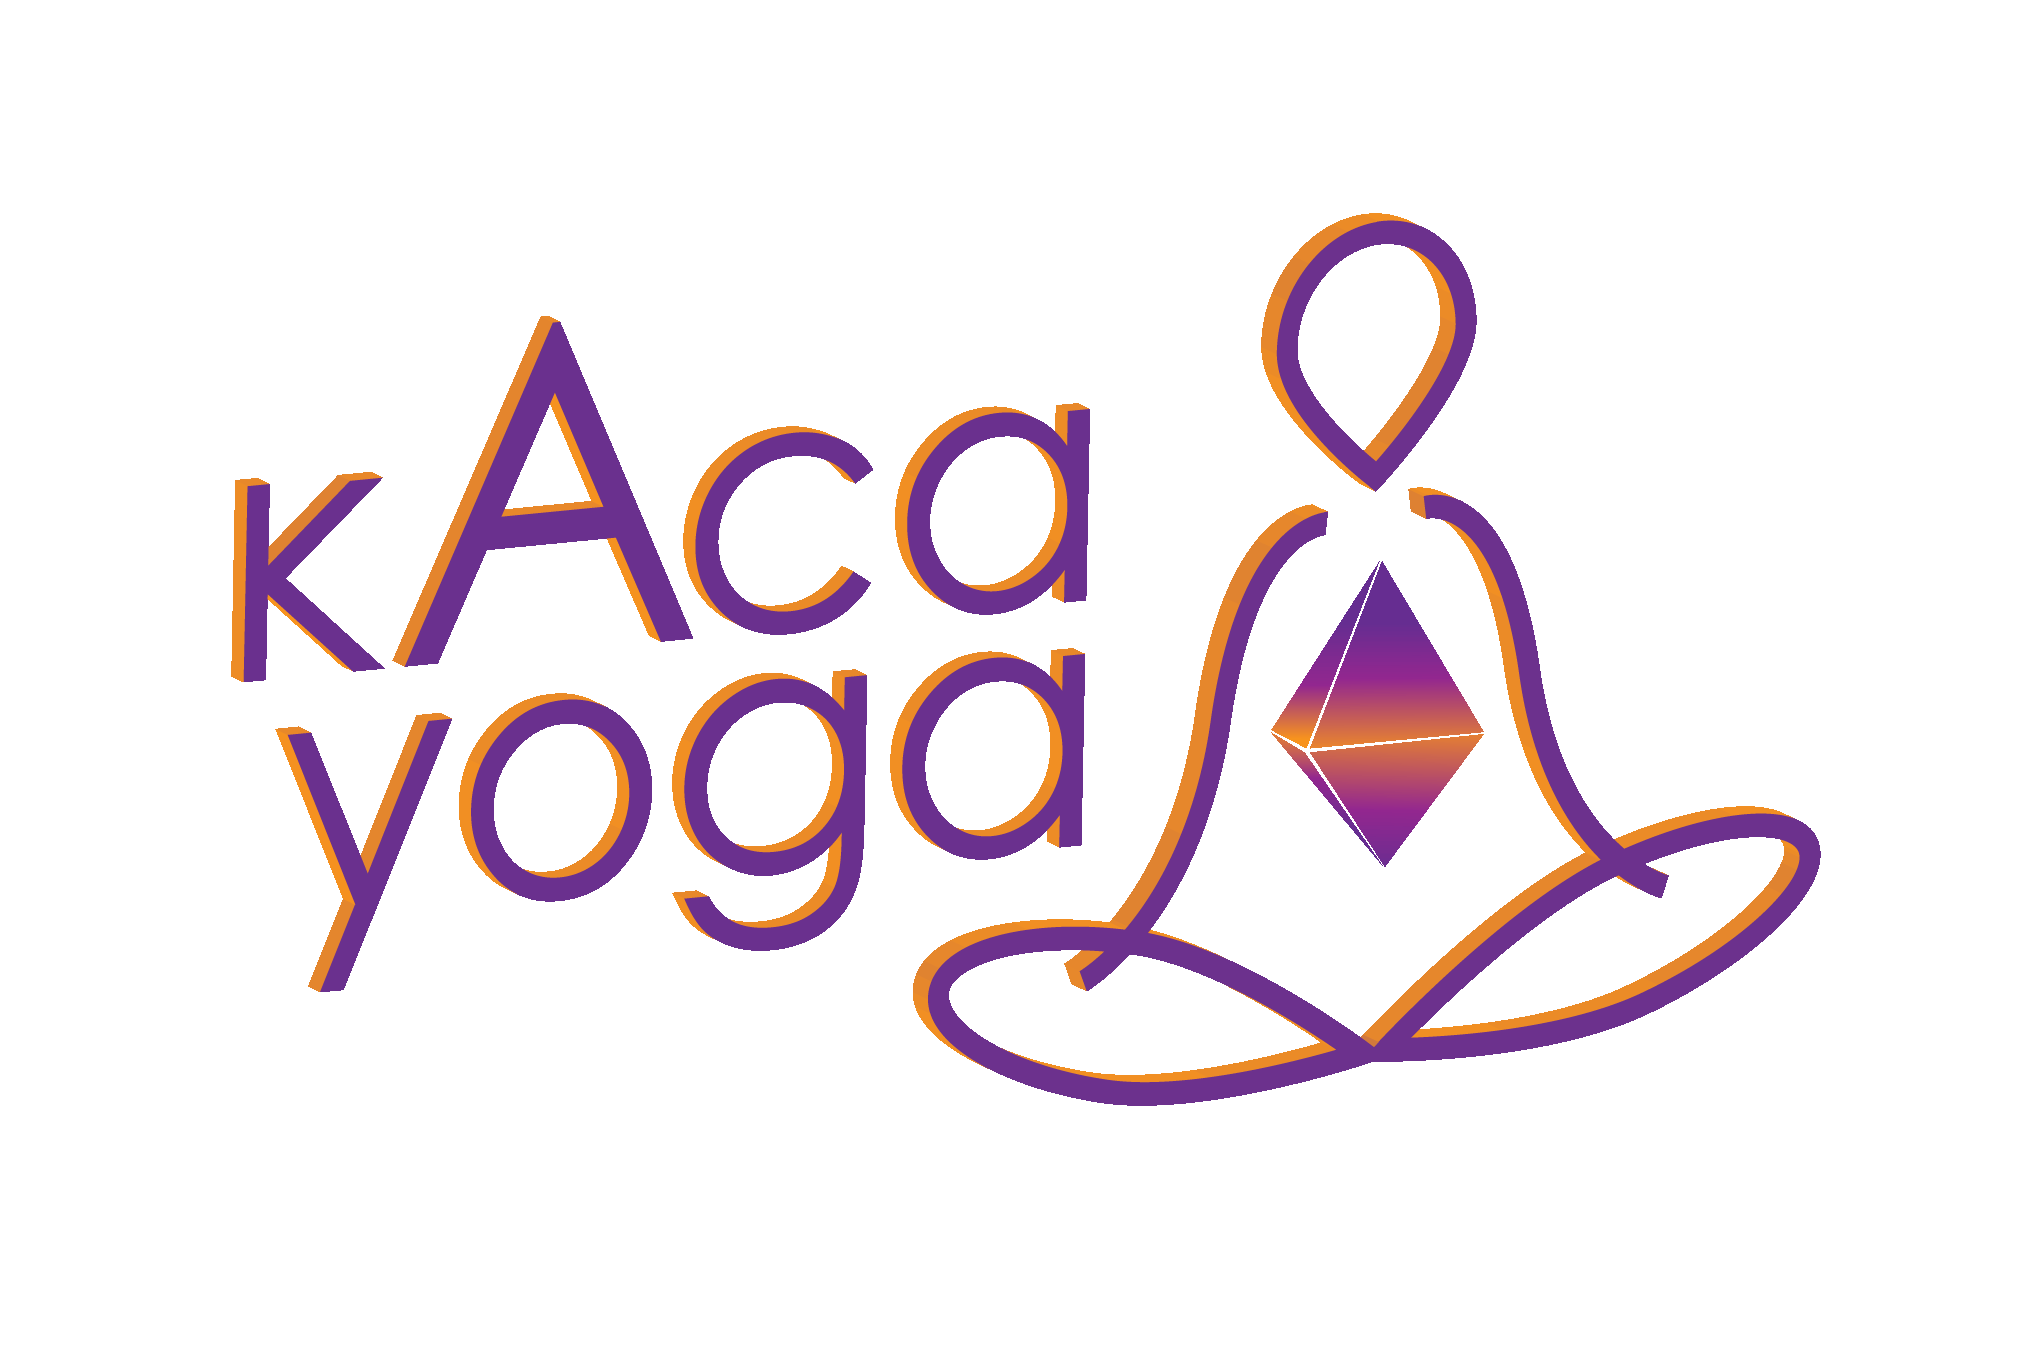 kAca Yoga